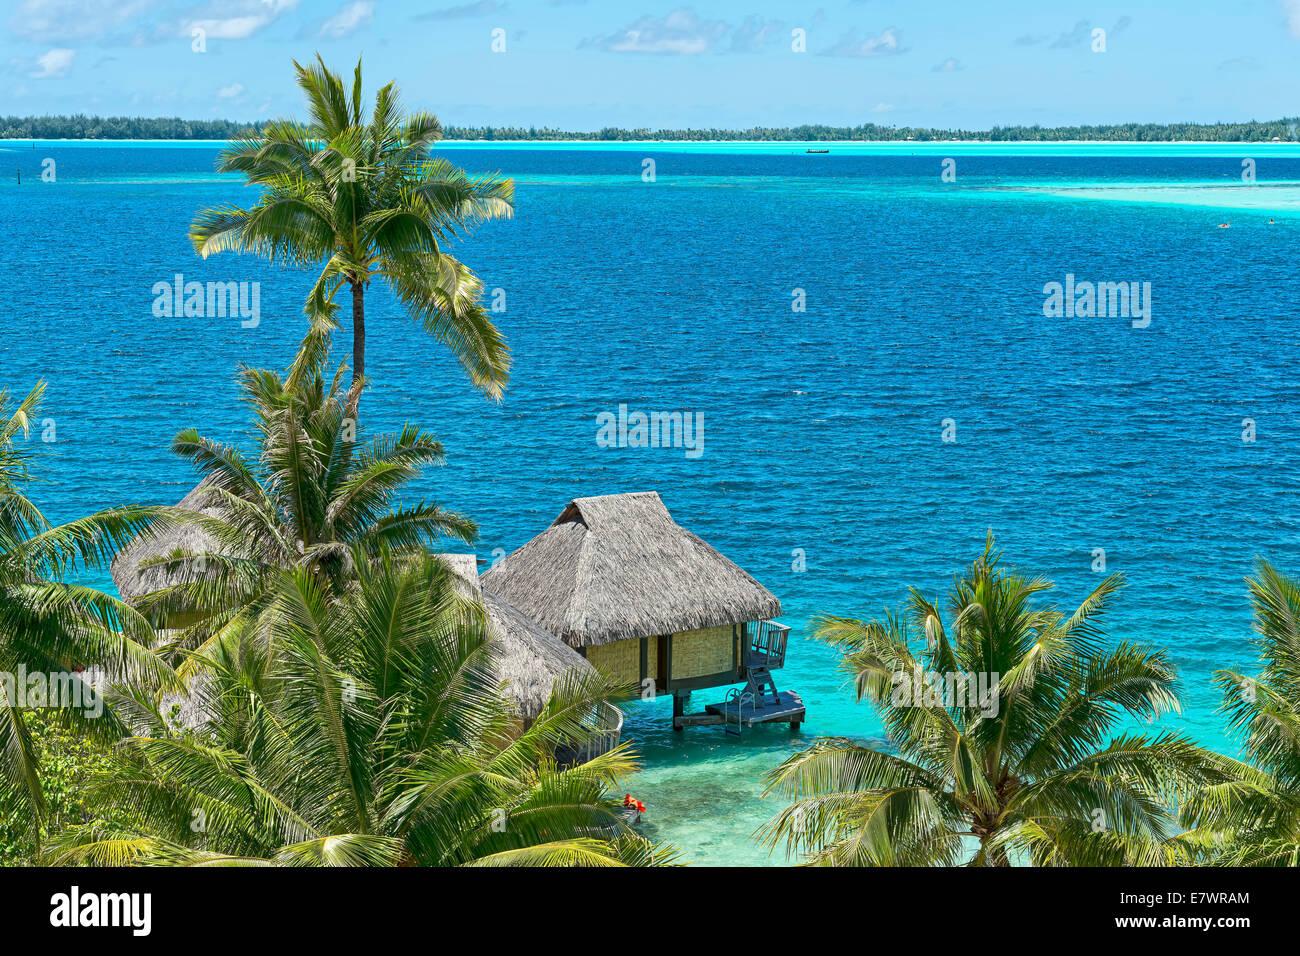 Overwater bungalow, South Pacific, Bora Bora, French Polynesia - Stock Image